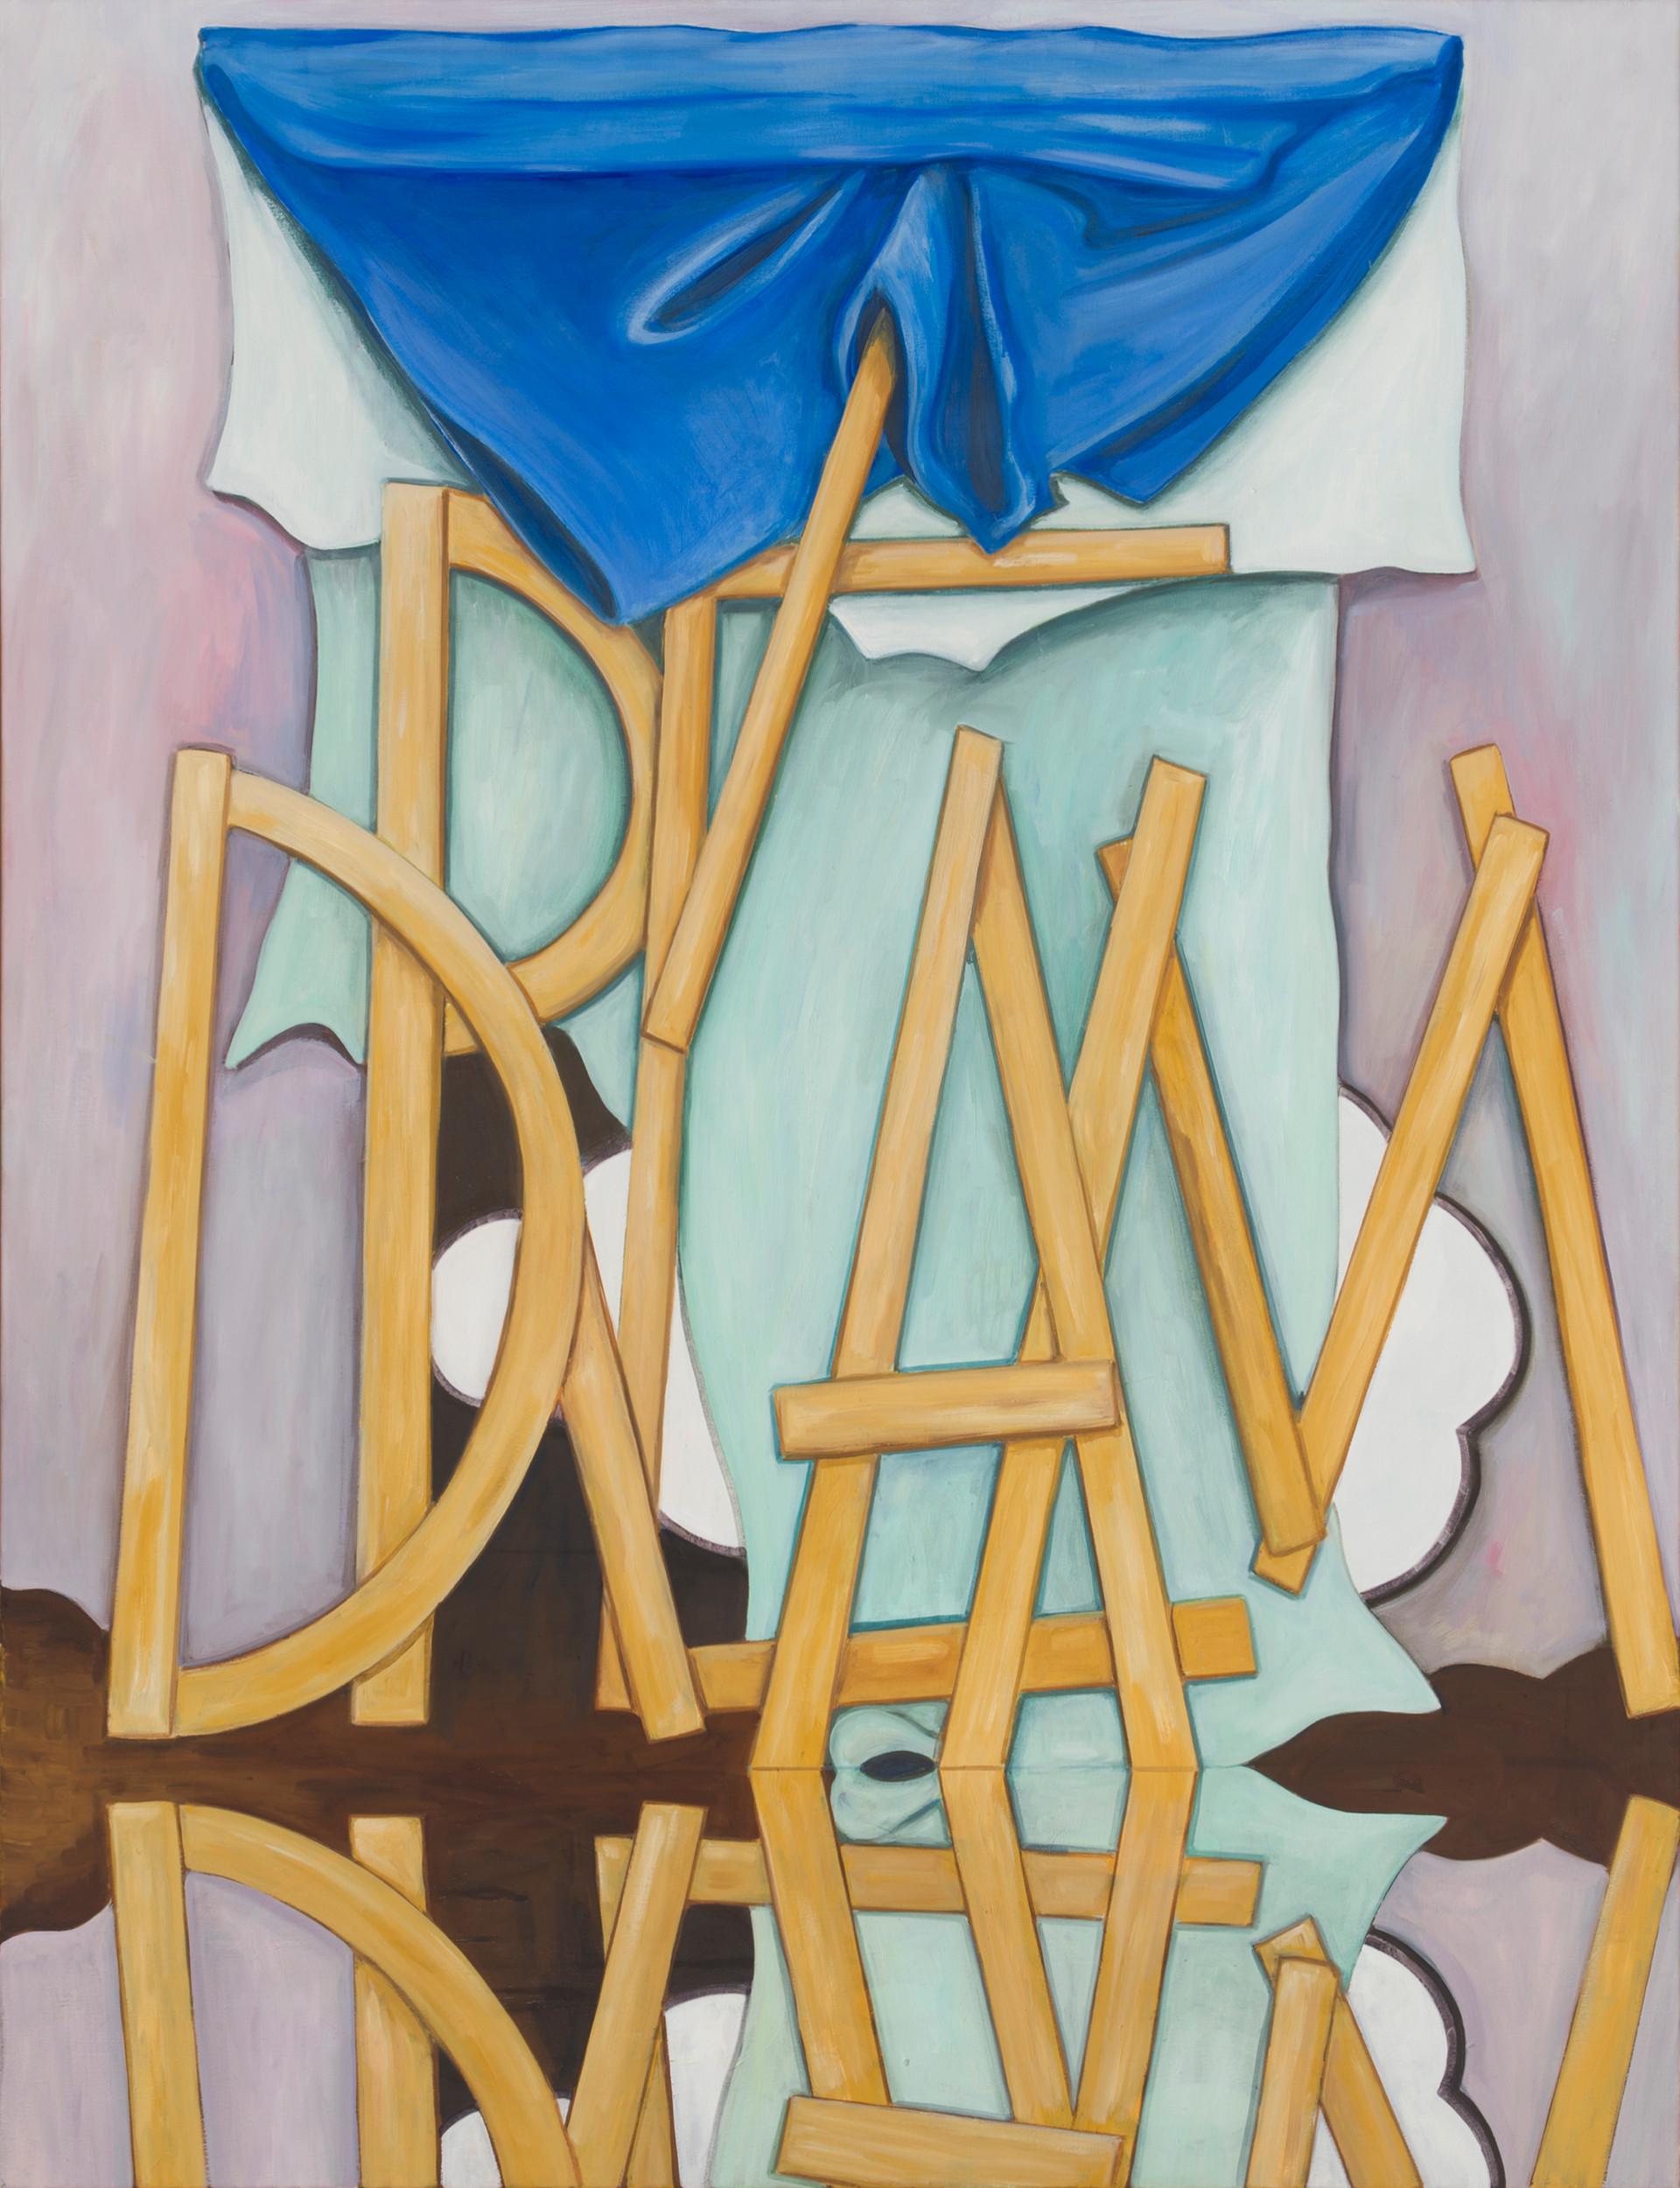 dream - 2013 - öl auf leinwand - 130 x 100 cm